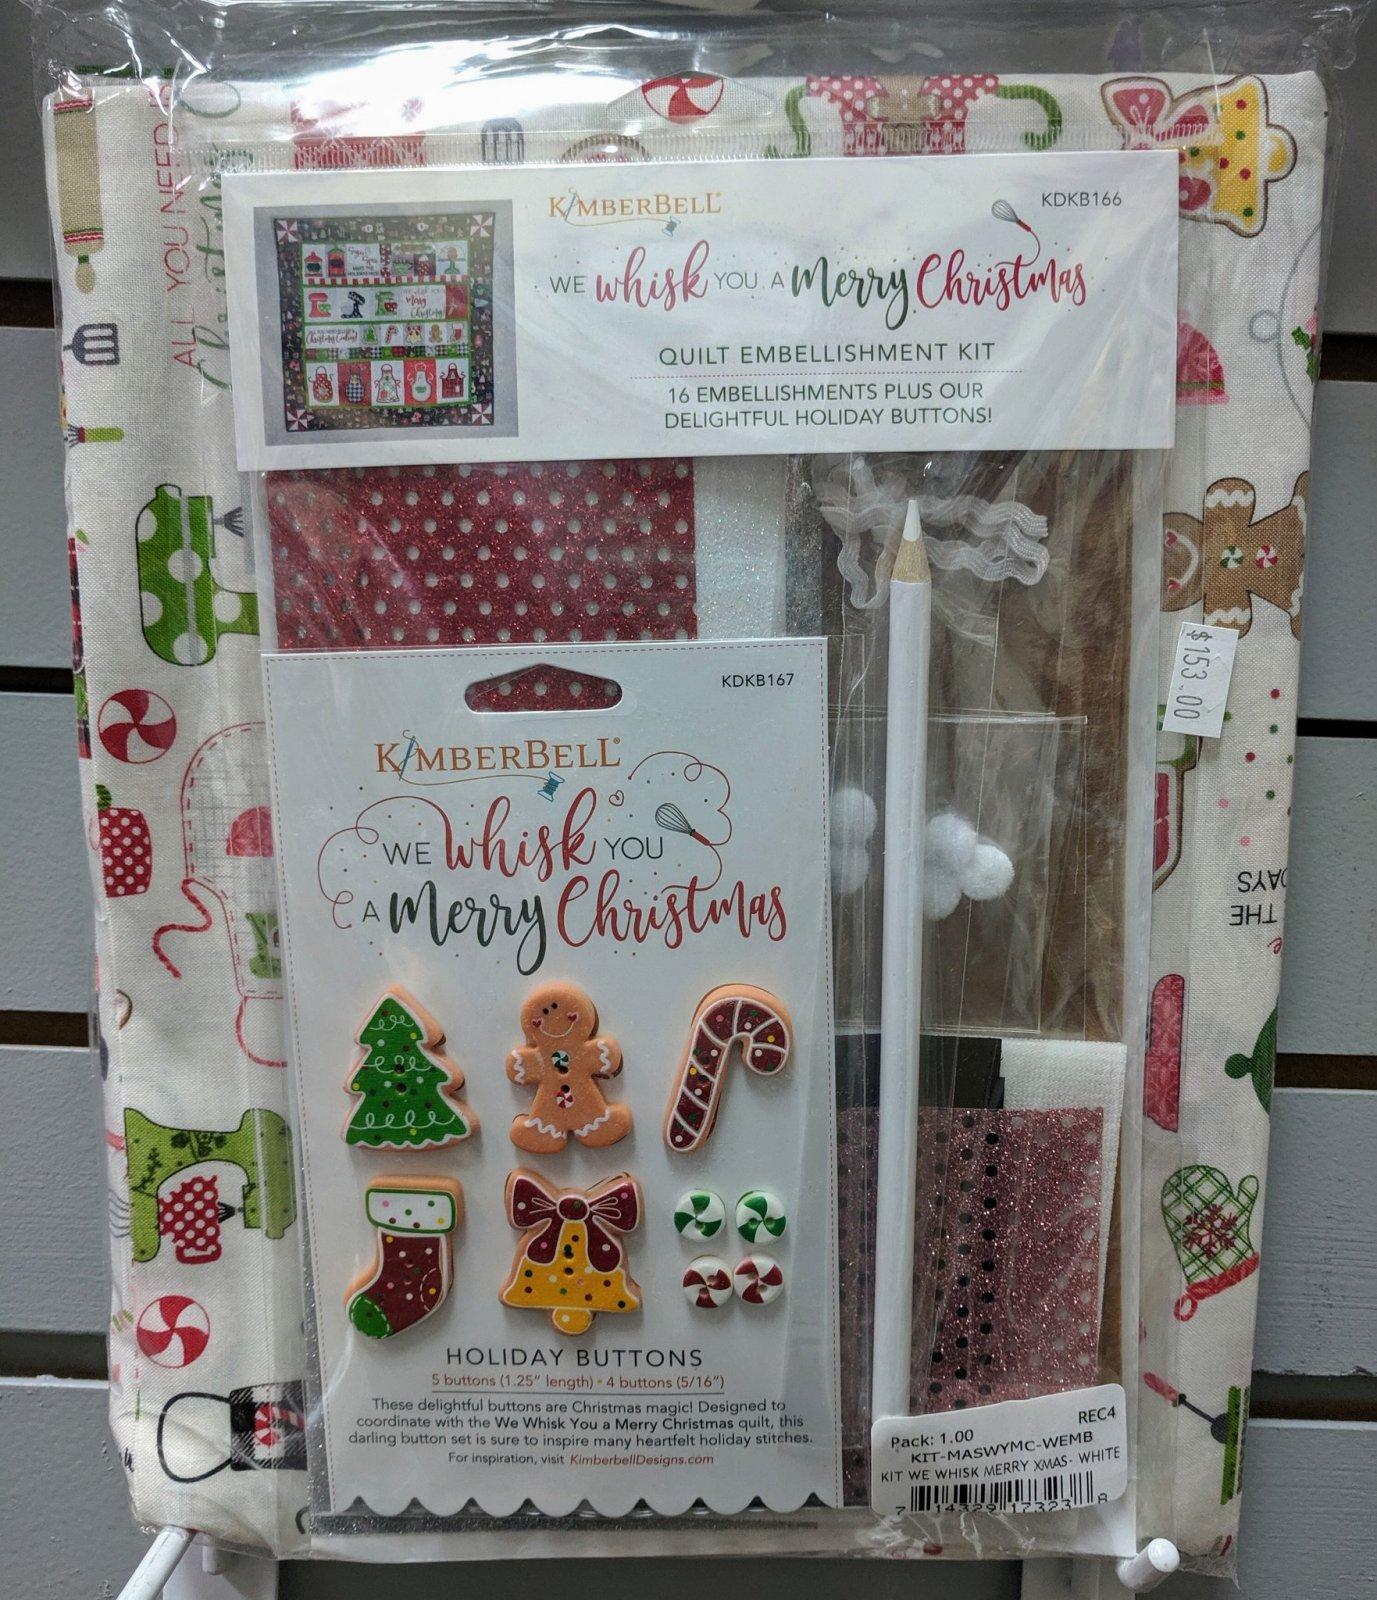 Kimberbell We Whisk You a Merry Christmas Kit